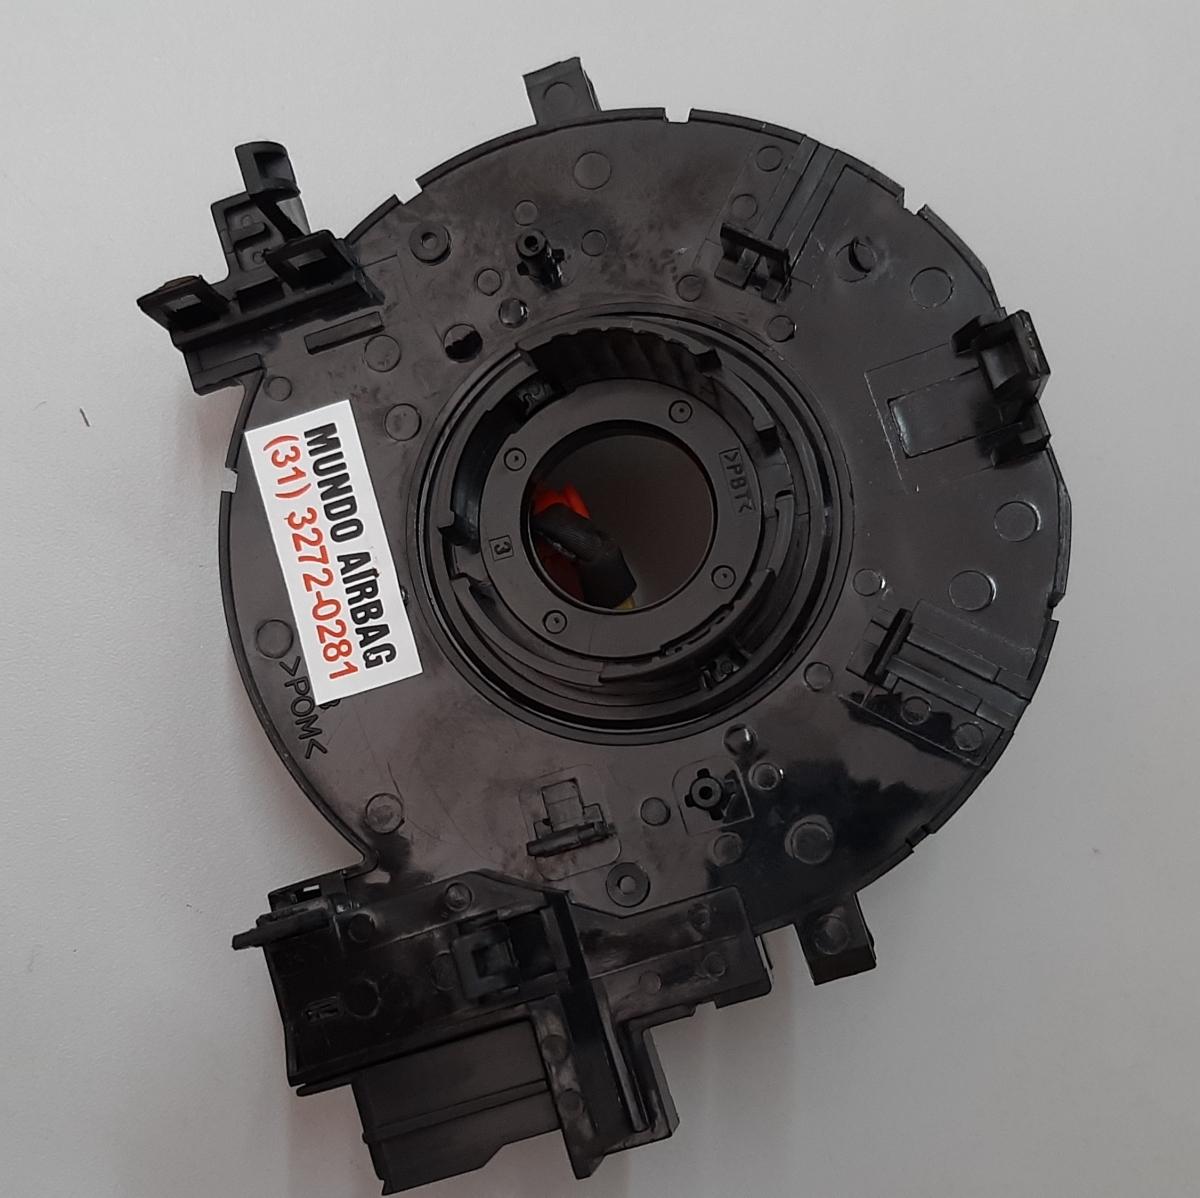 Fita Hard Disk Corolla 15 - Foto 1